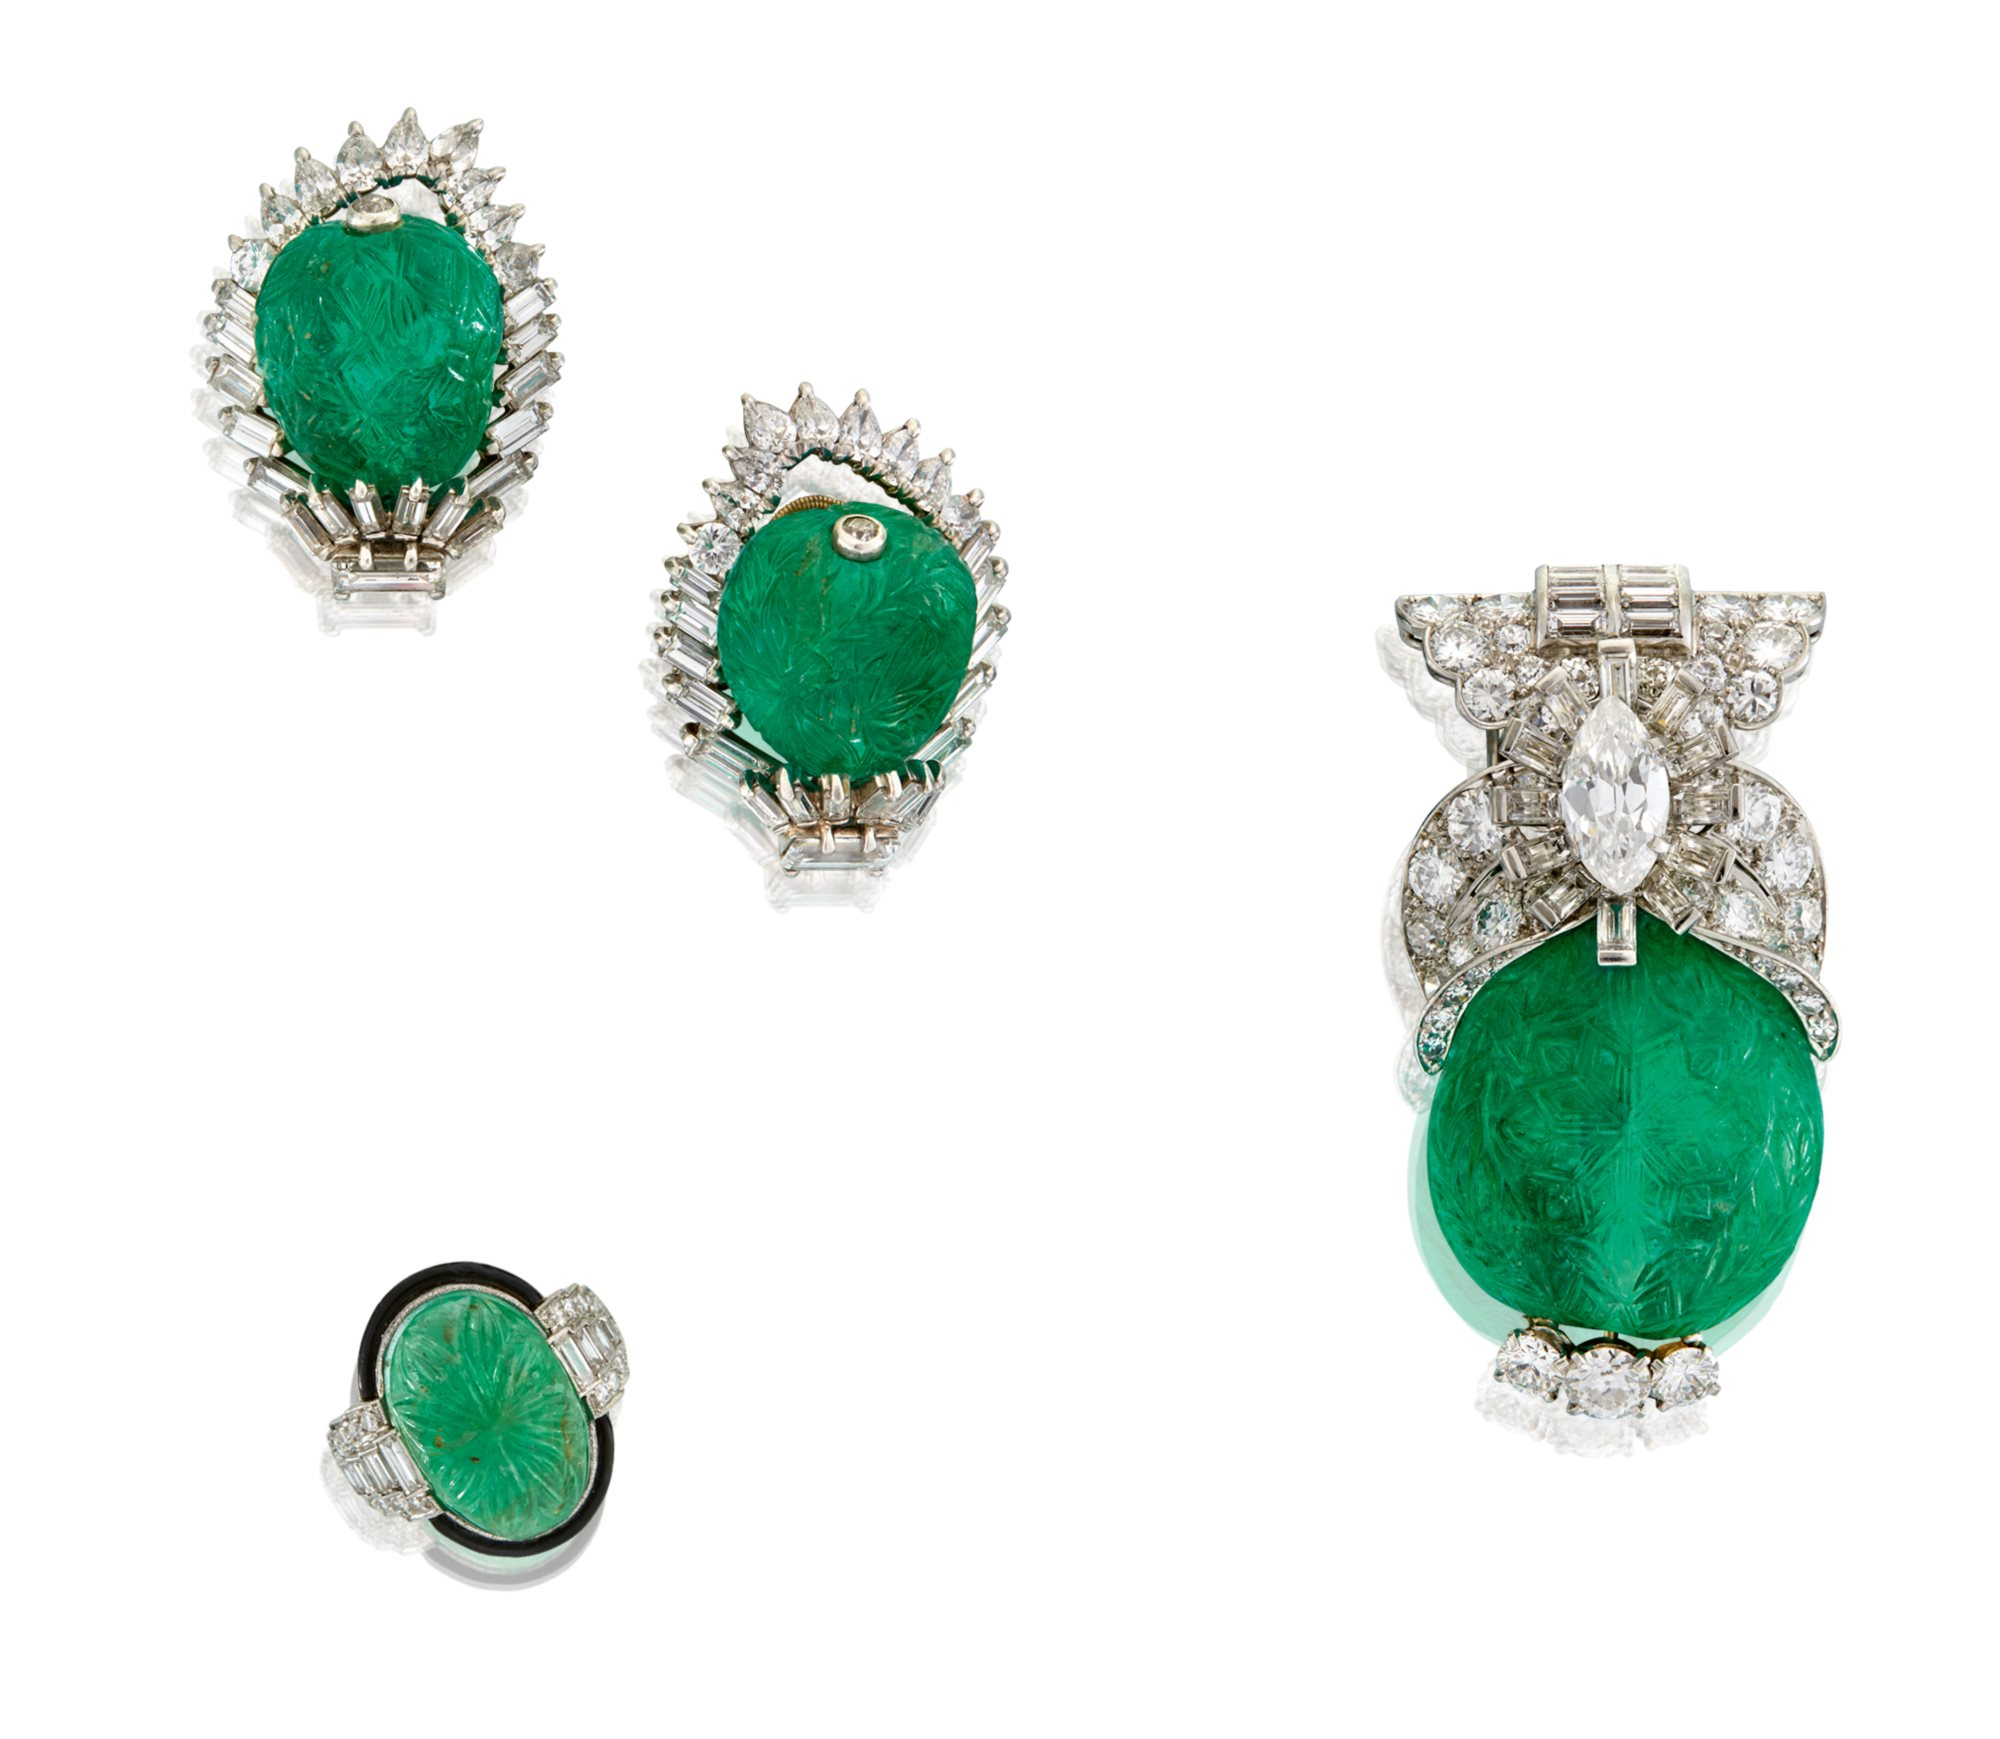 Clockwise: Lot 171: Carved emerald, diamond & platinum ear clips, Monture Cartier, $40,000-60,000; Lot 173: Carved emerald, diamond & platinum brooch, Cartier, $60,000-80,000; Lot 172: Art Deco platinum, emerald, diamond & enamel ring, $5,000-7,000